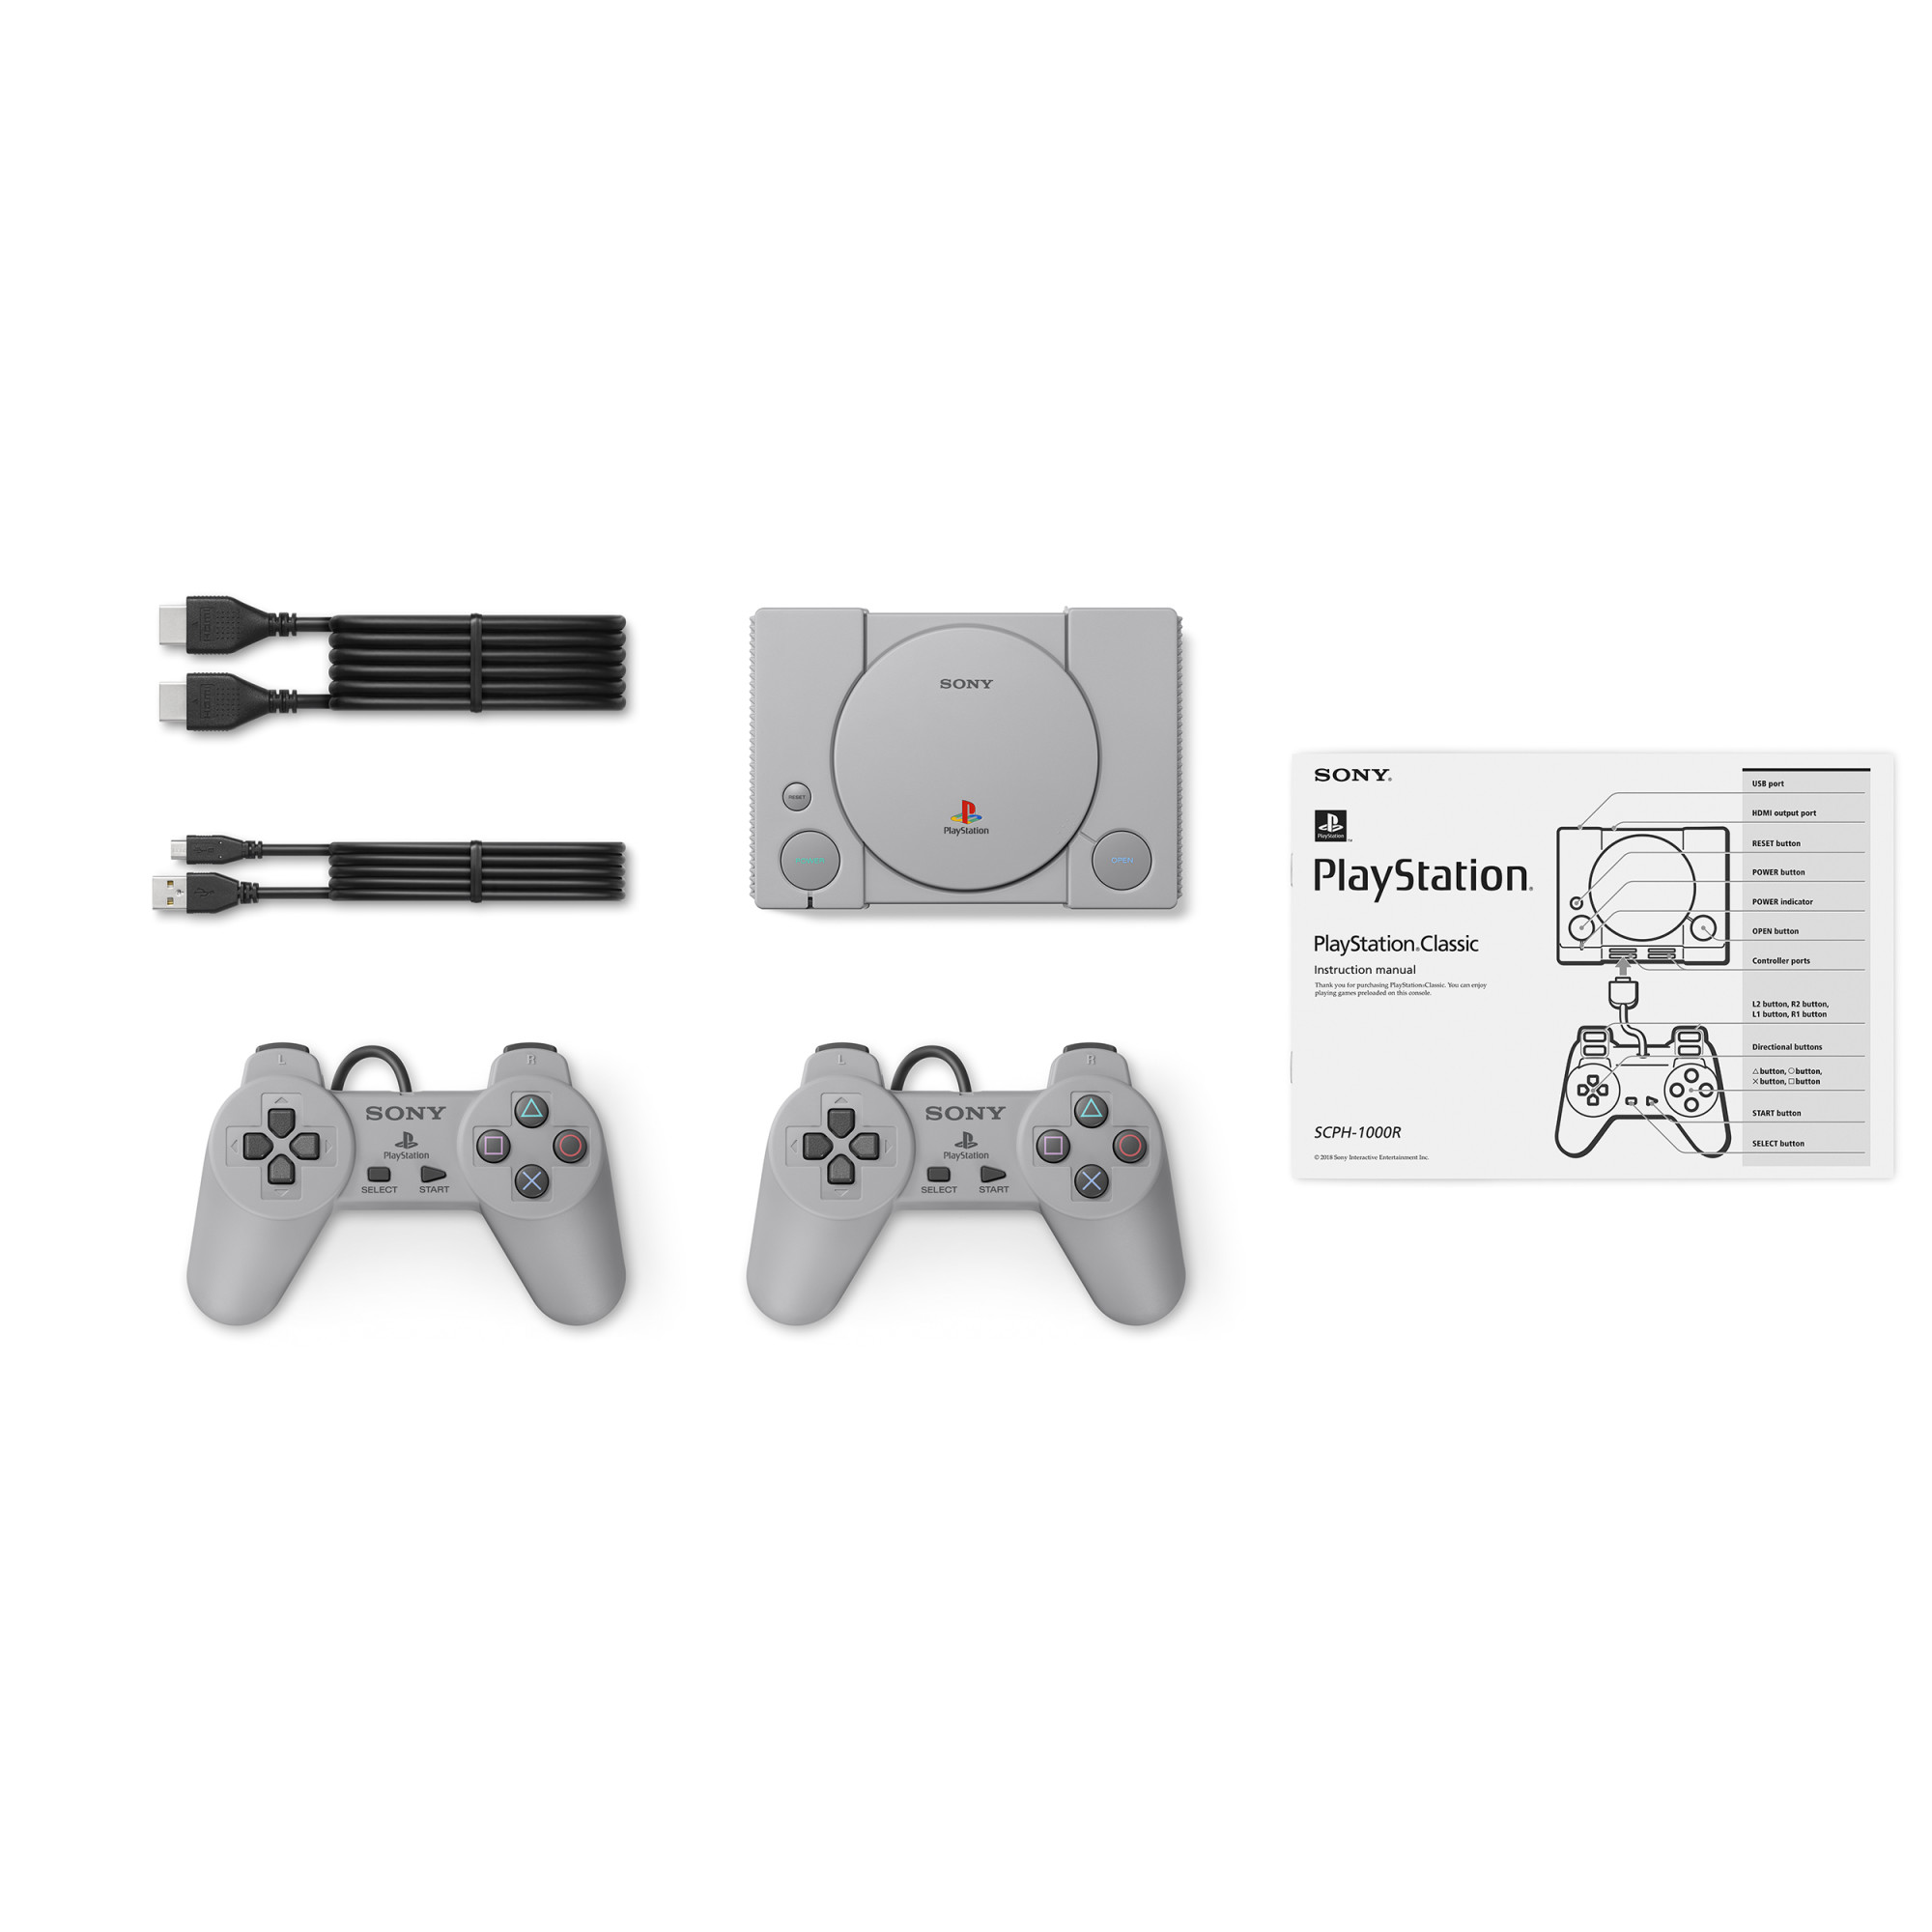 Consola Sony Playstation Classic + 20 jocuri preinstalate 5